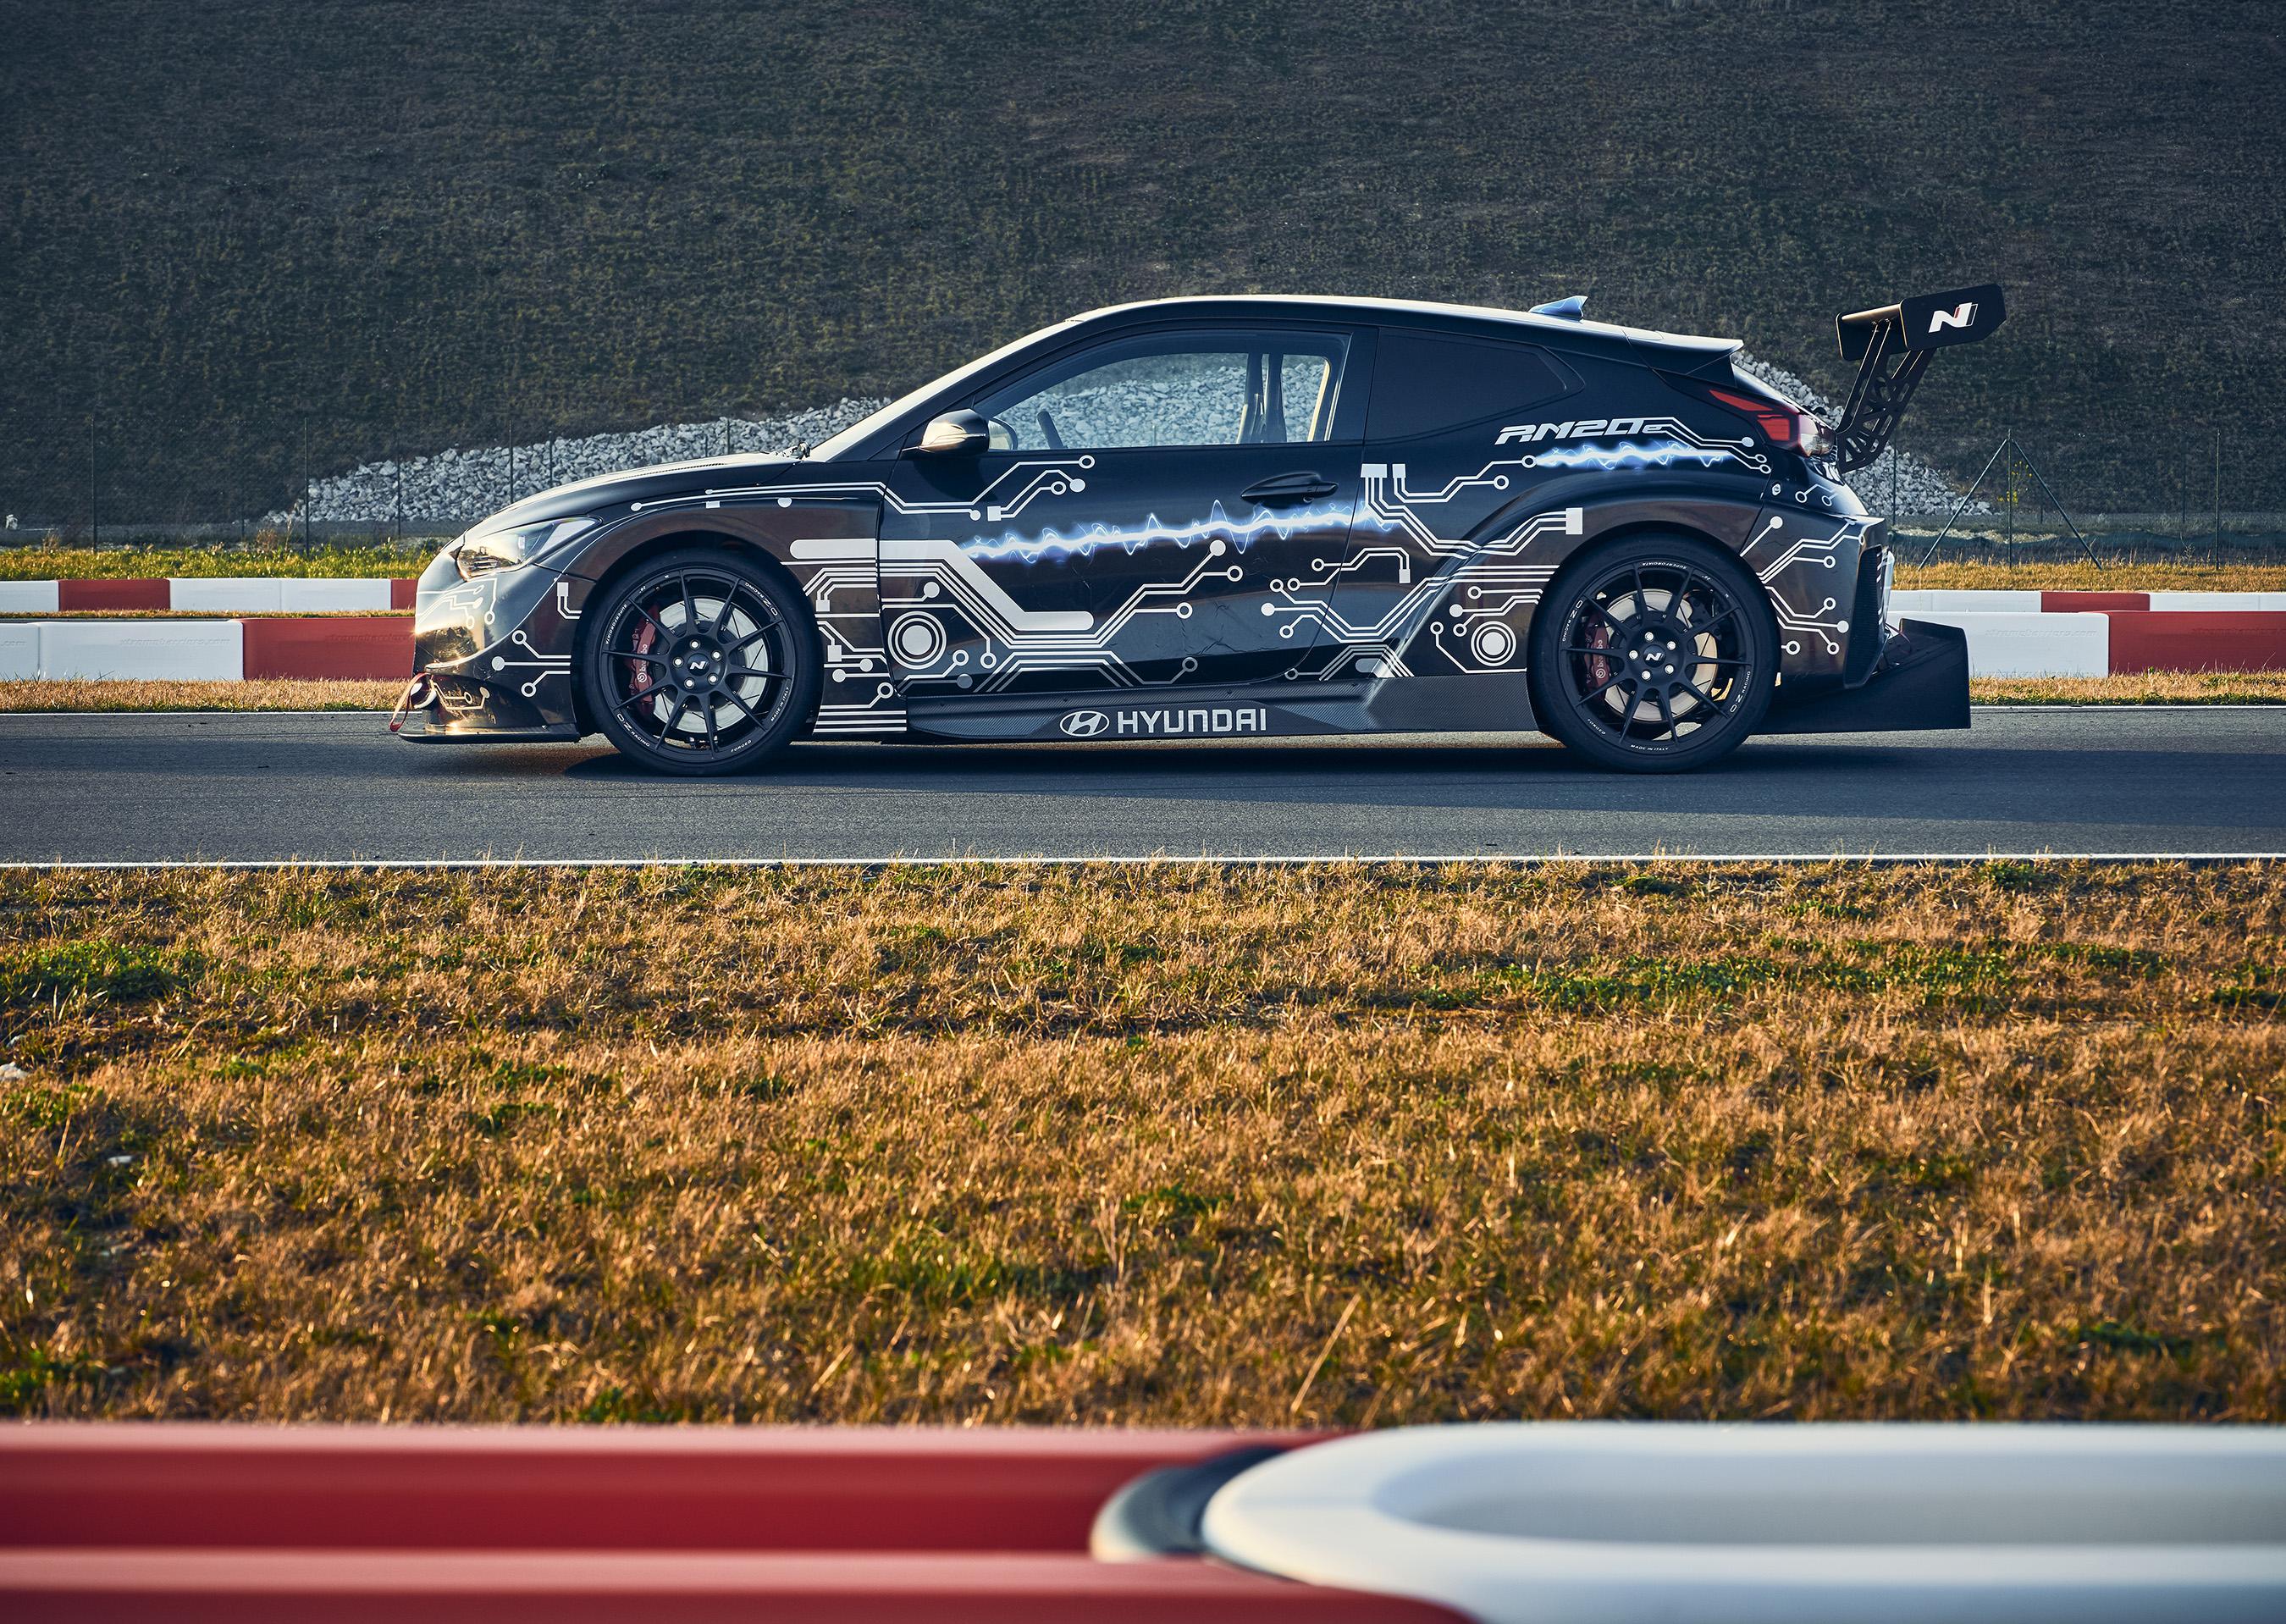 Hyundai introduces next-generation electrified RM20e Racing Midship Sports Car